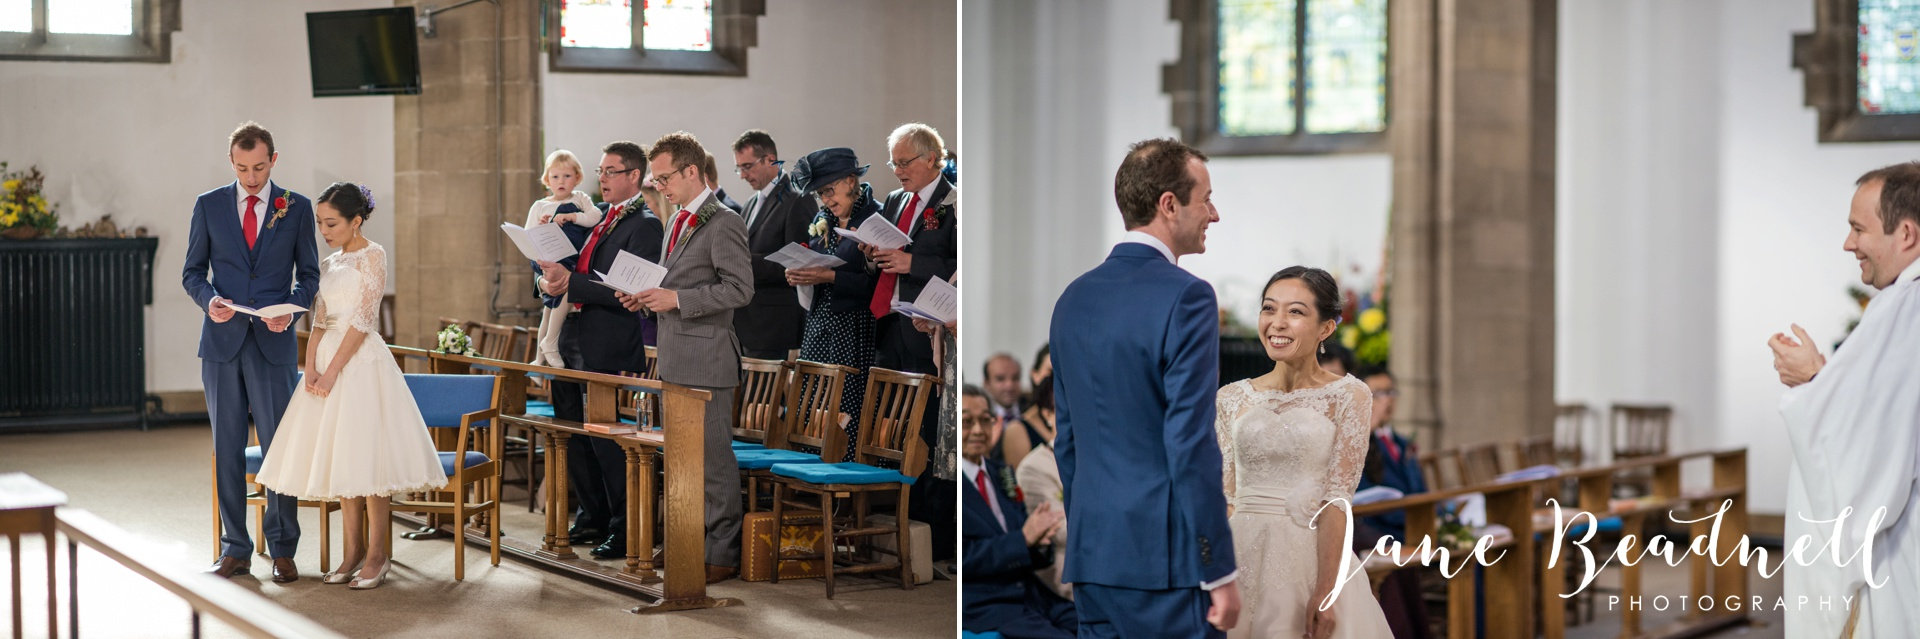 The Tetley Leeds Wedding Photography by Jane Beadnell_0053